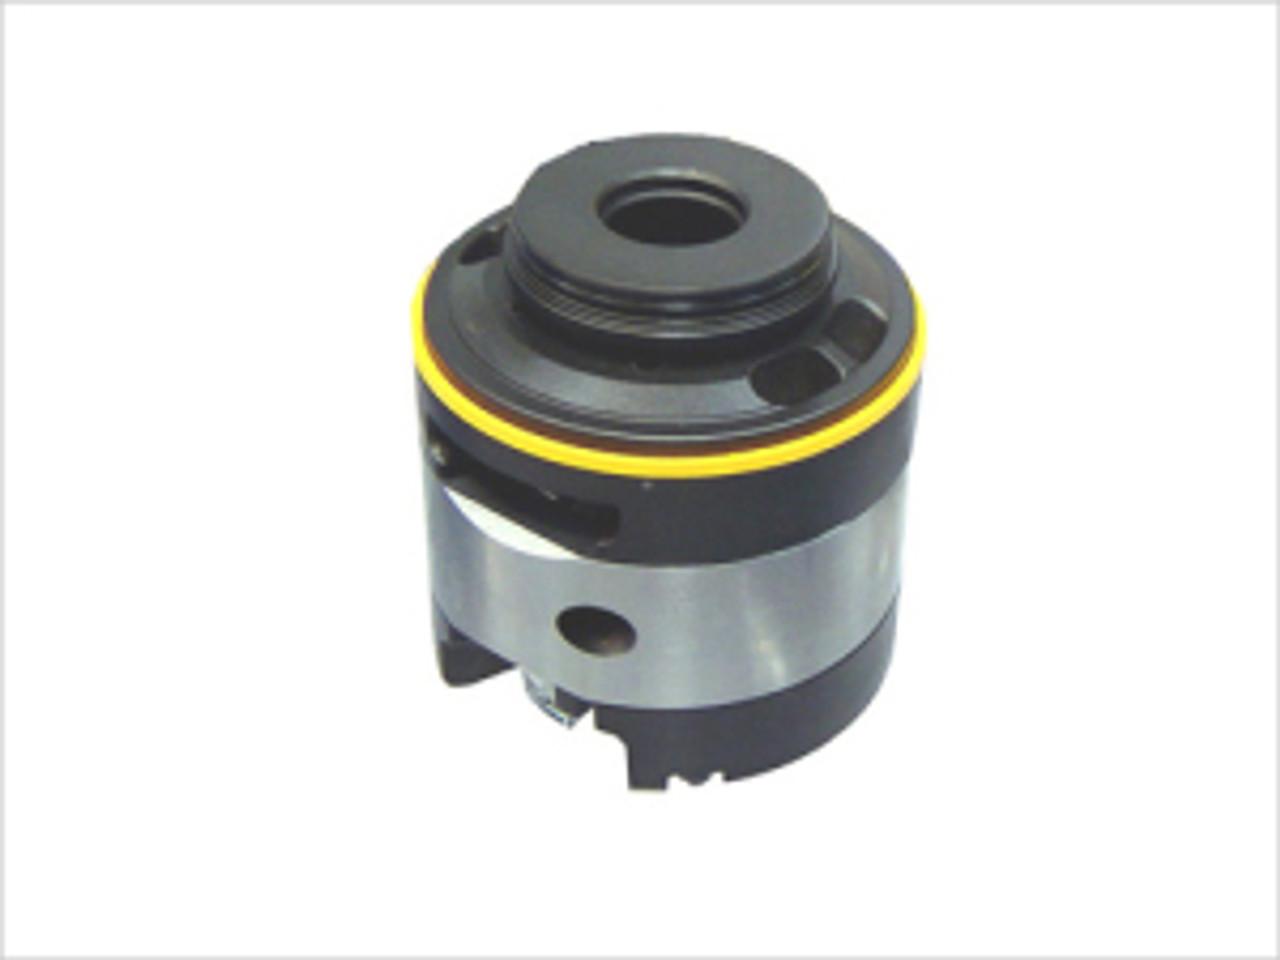 02-137565 Vickers Hydraulic Vane Pump Replacement Cartridge Kit V20 11 GPM Pump